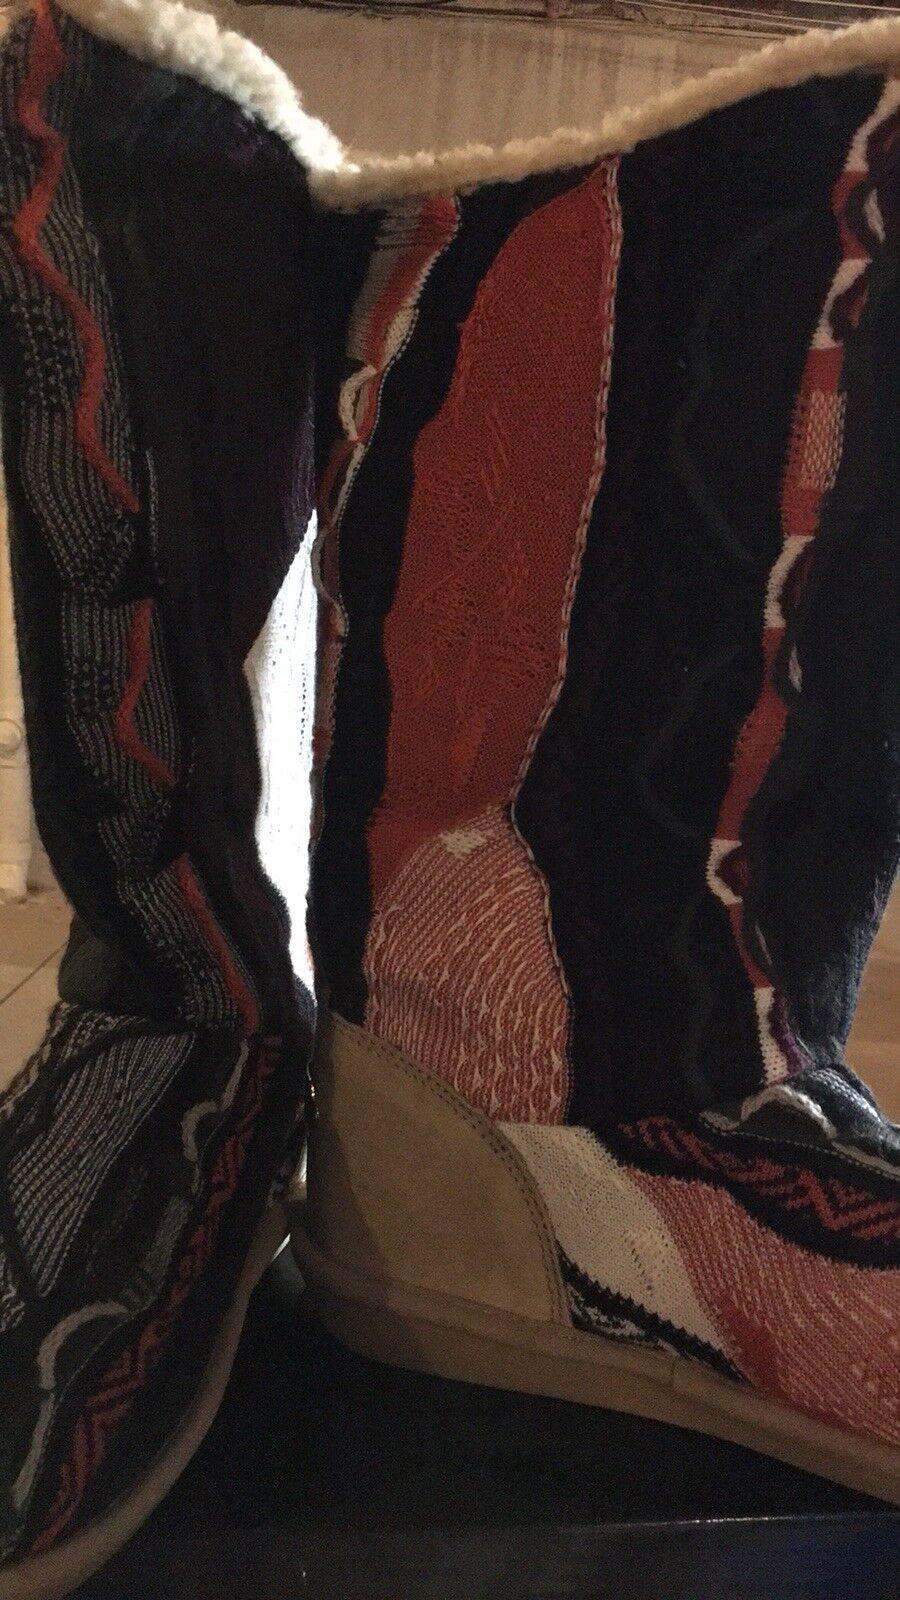 Coogi Tan Boots (Size 10)